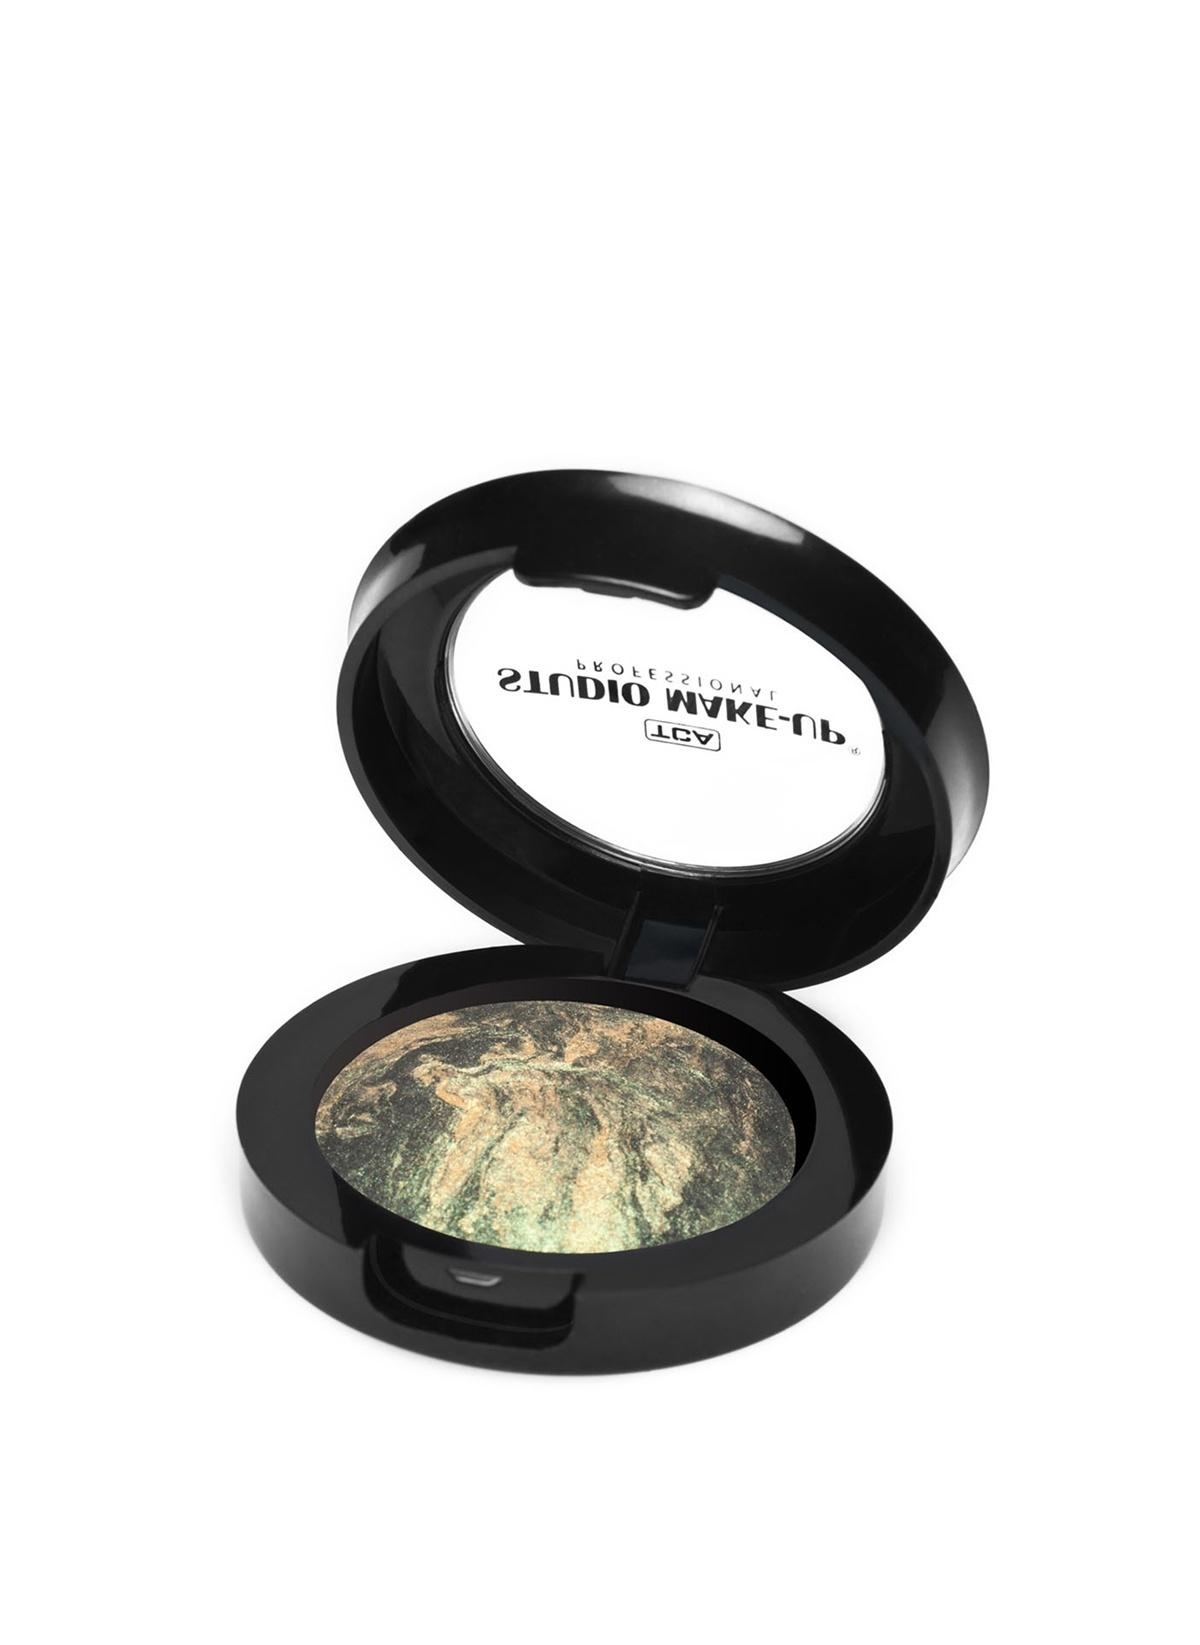 Tca Studio Make Up Göz Farı Tca Studıo Make-up Eyeshadow Moon Shıne – 28.6 TL